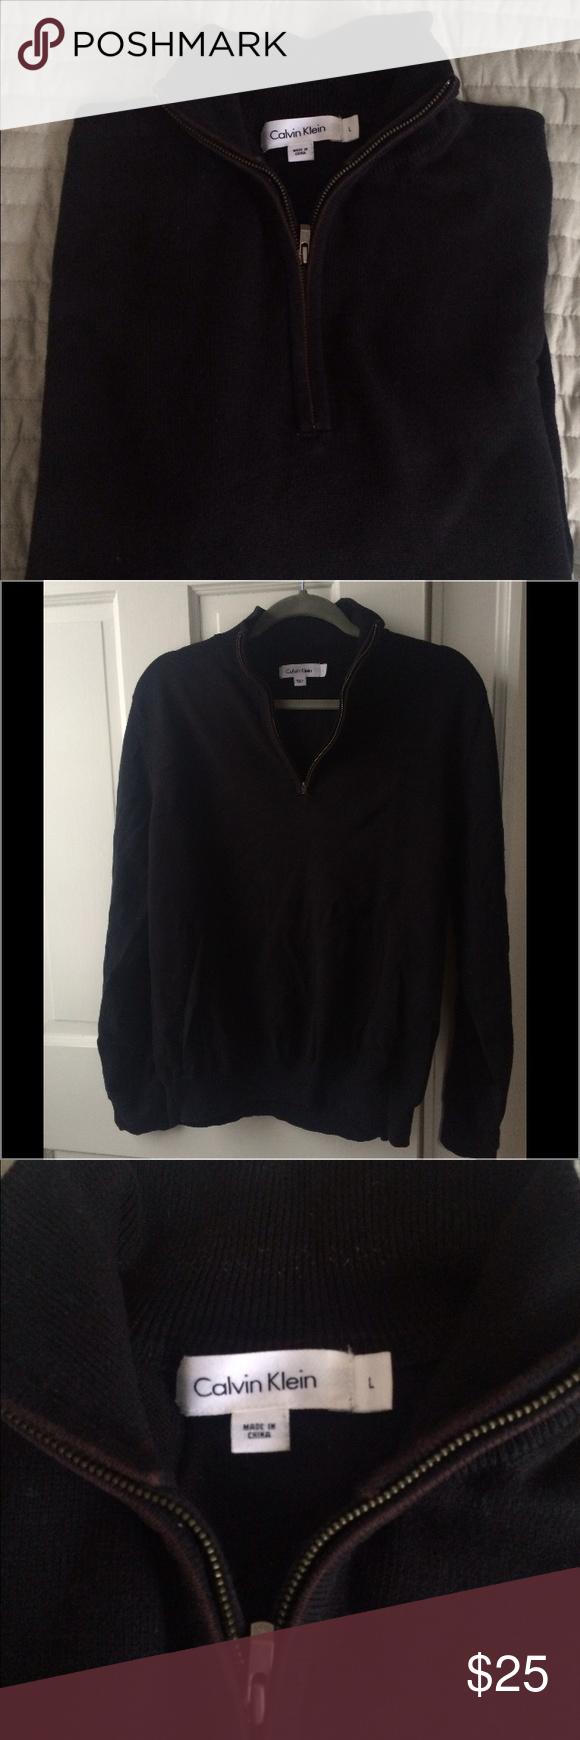 Calvin Klein black quarter zip sweater Calvin Klein black quarter zip sweater.  EUC.   Comes from a pet-free, smoke-free home. Calvin Klein Sweaters Zip Up